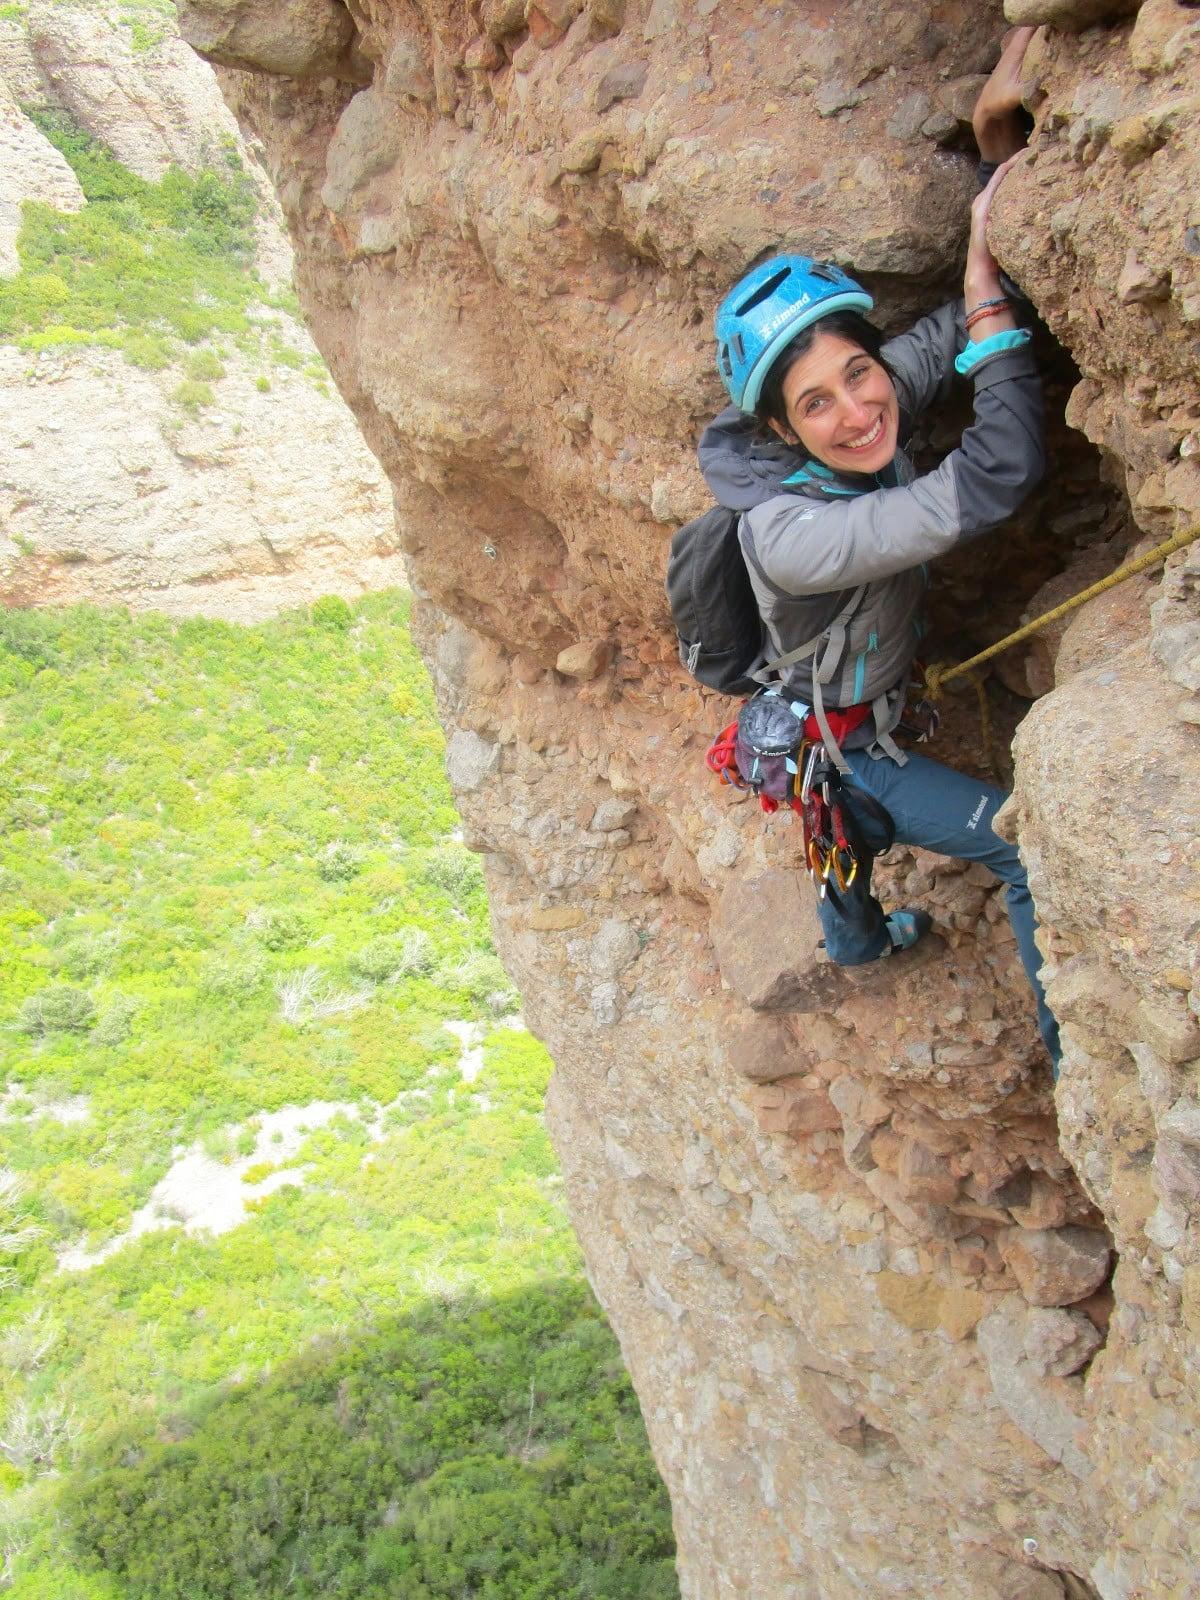 escalar la aguja roja dificultad escalada